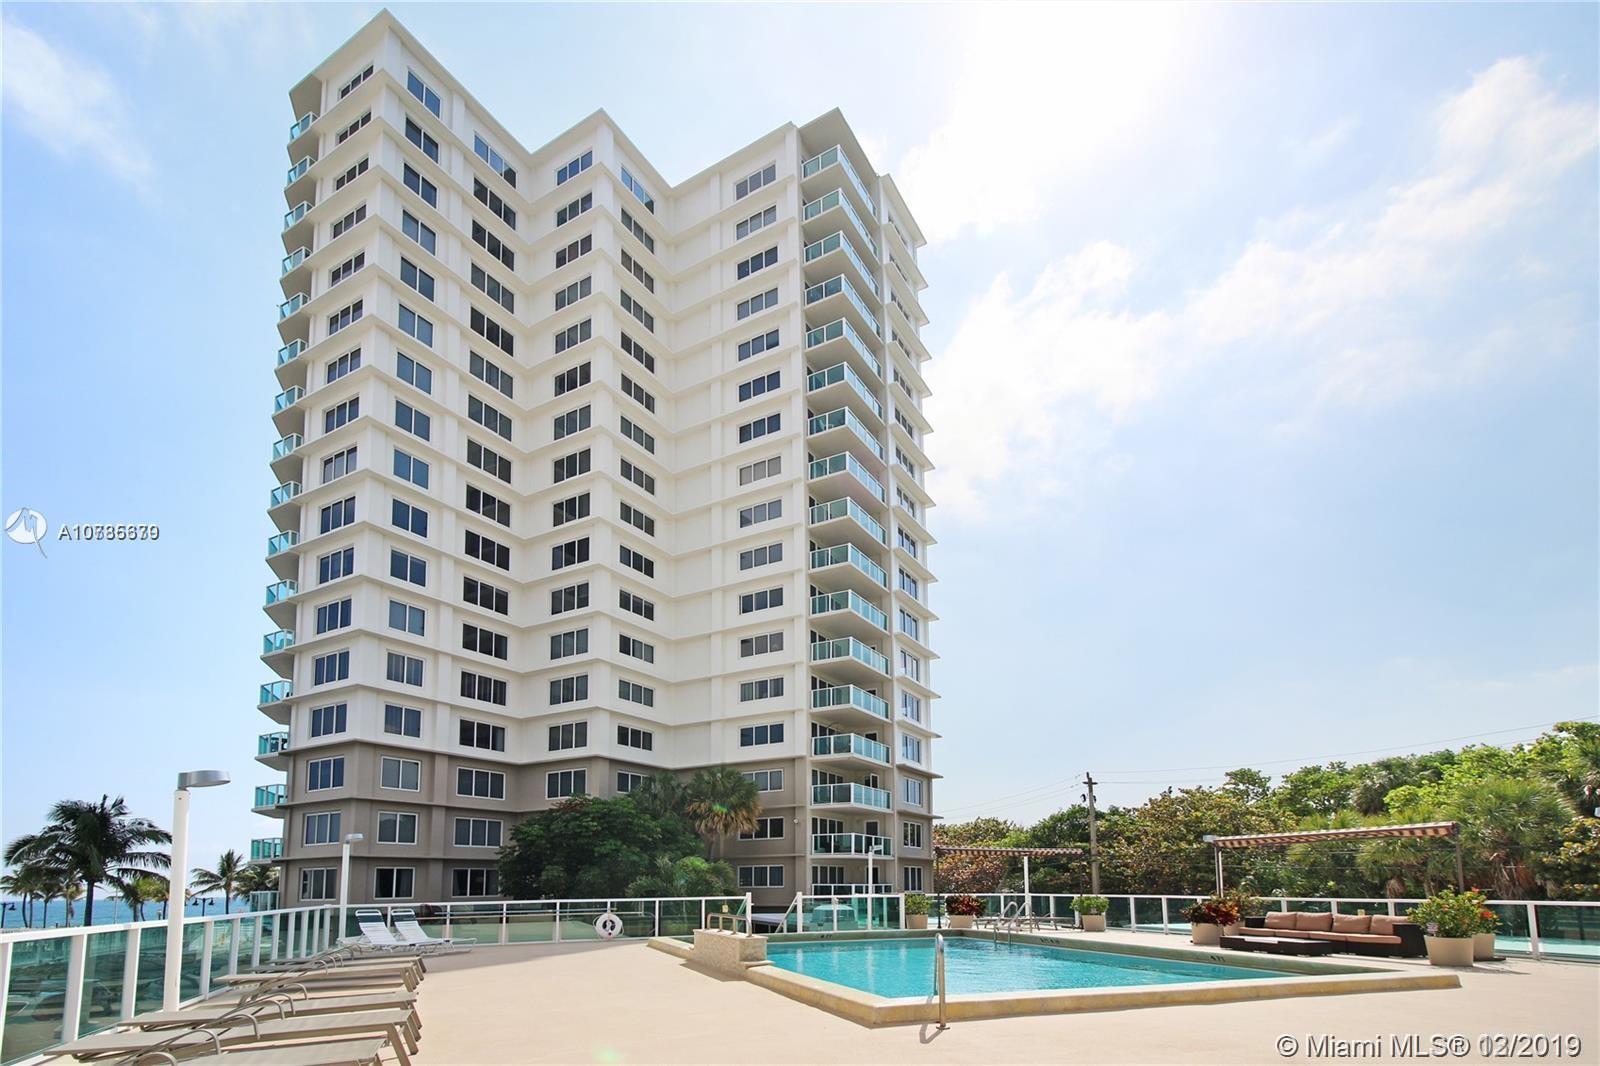 1151 N Ft Lauderdale Beach Blvd, 1B - Fort Lauderdale, Florida